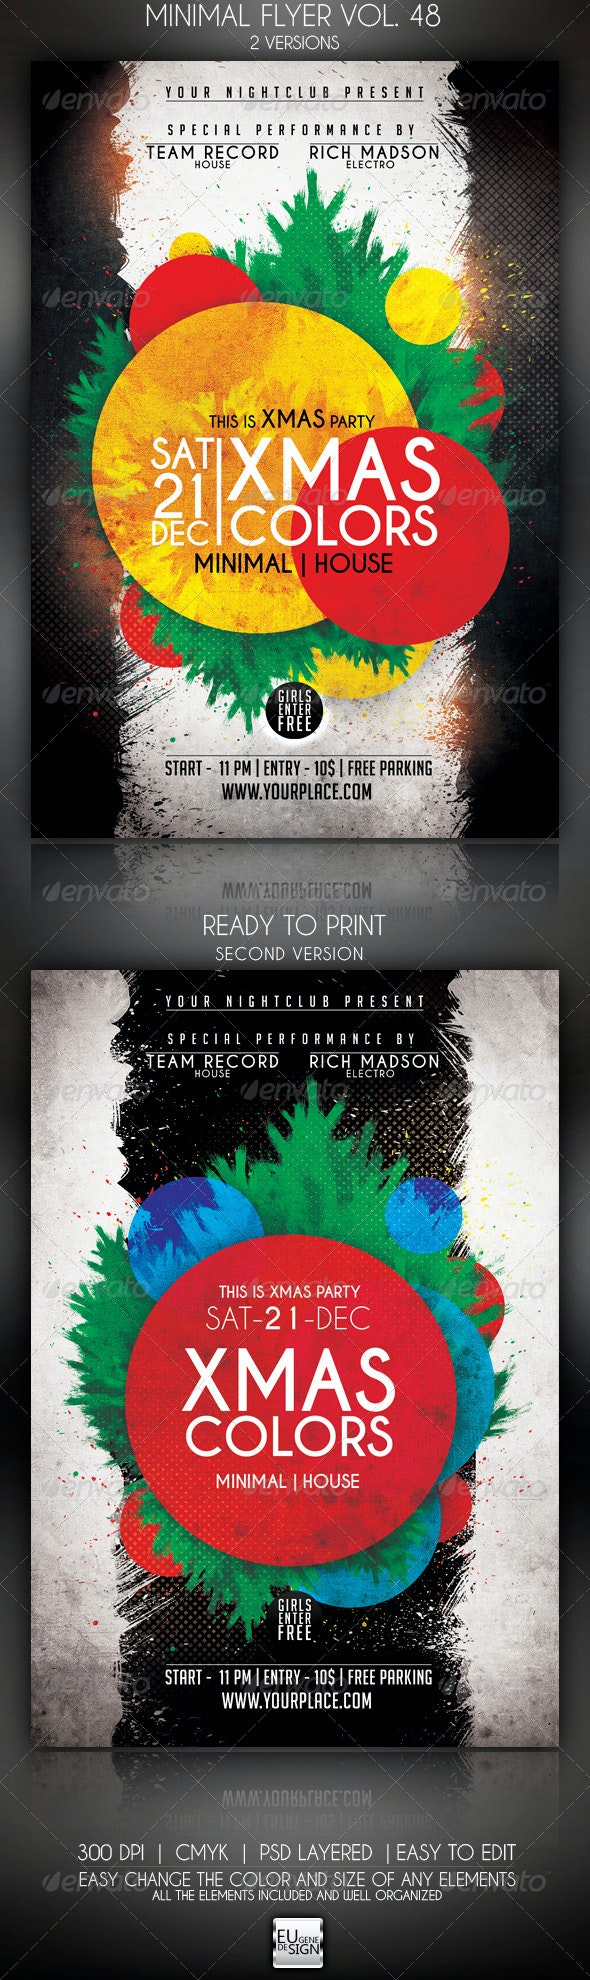 Minimal Flyer Vol. 48 - Clubs & Parties Events